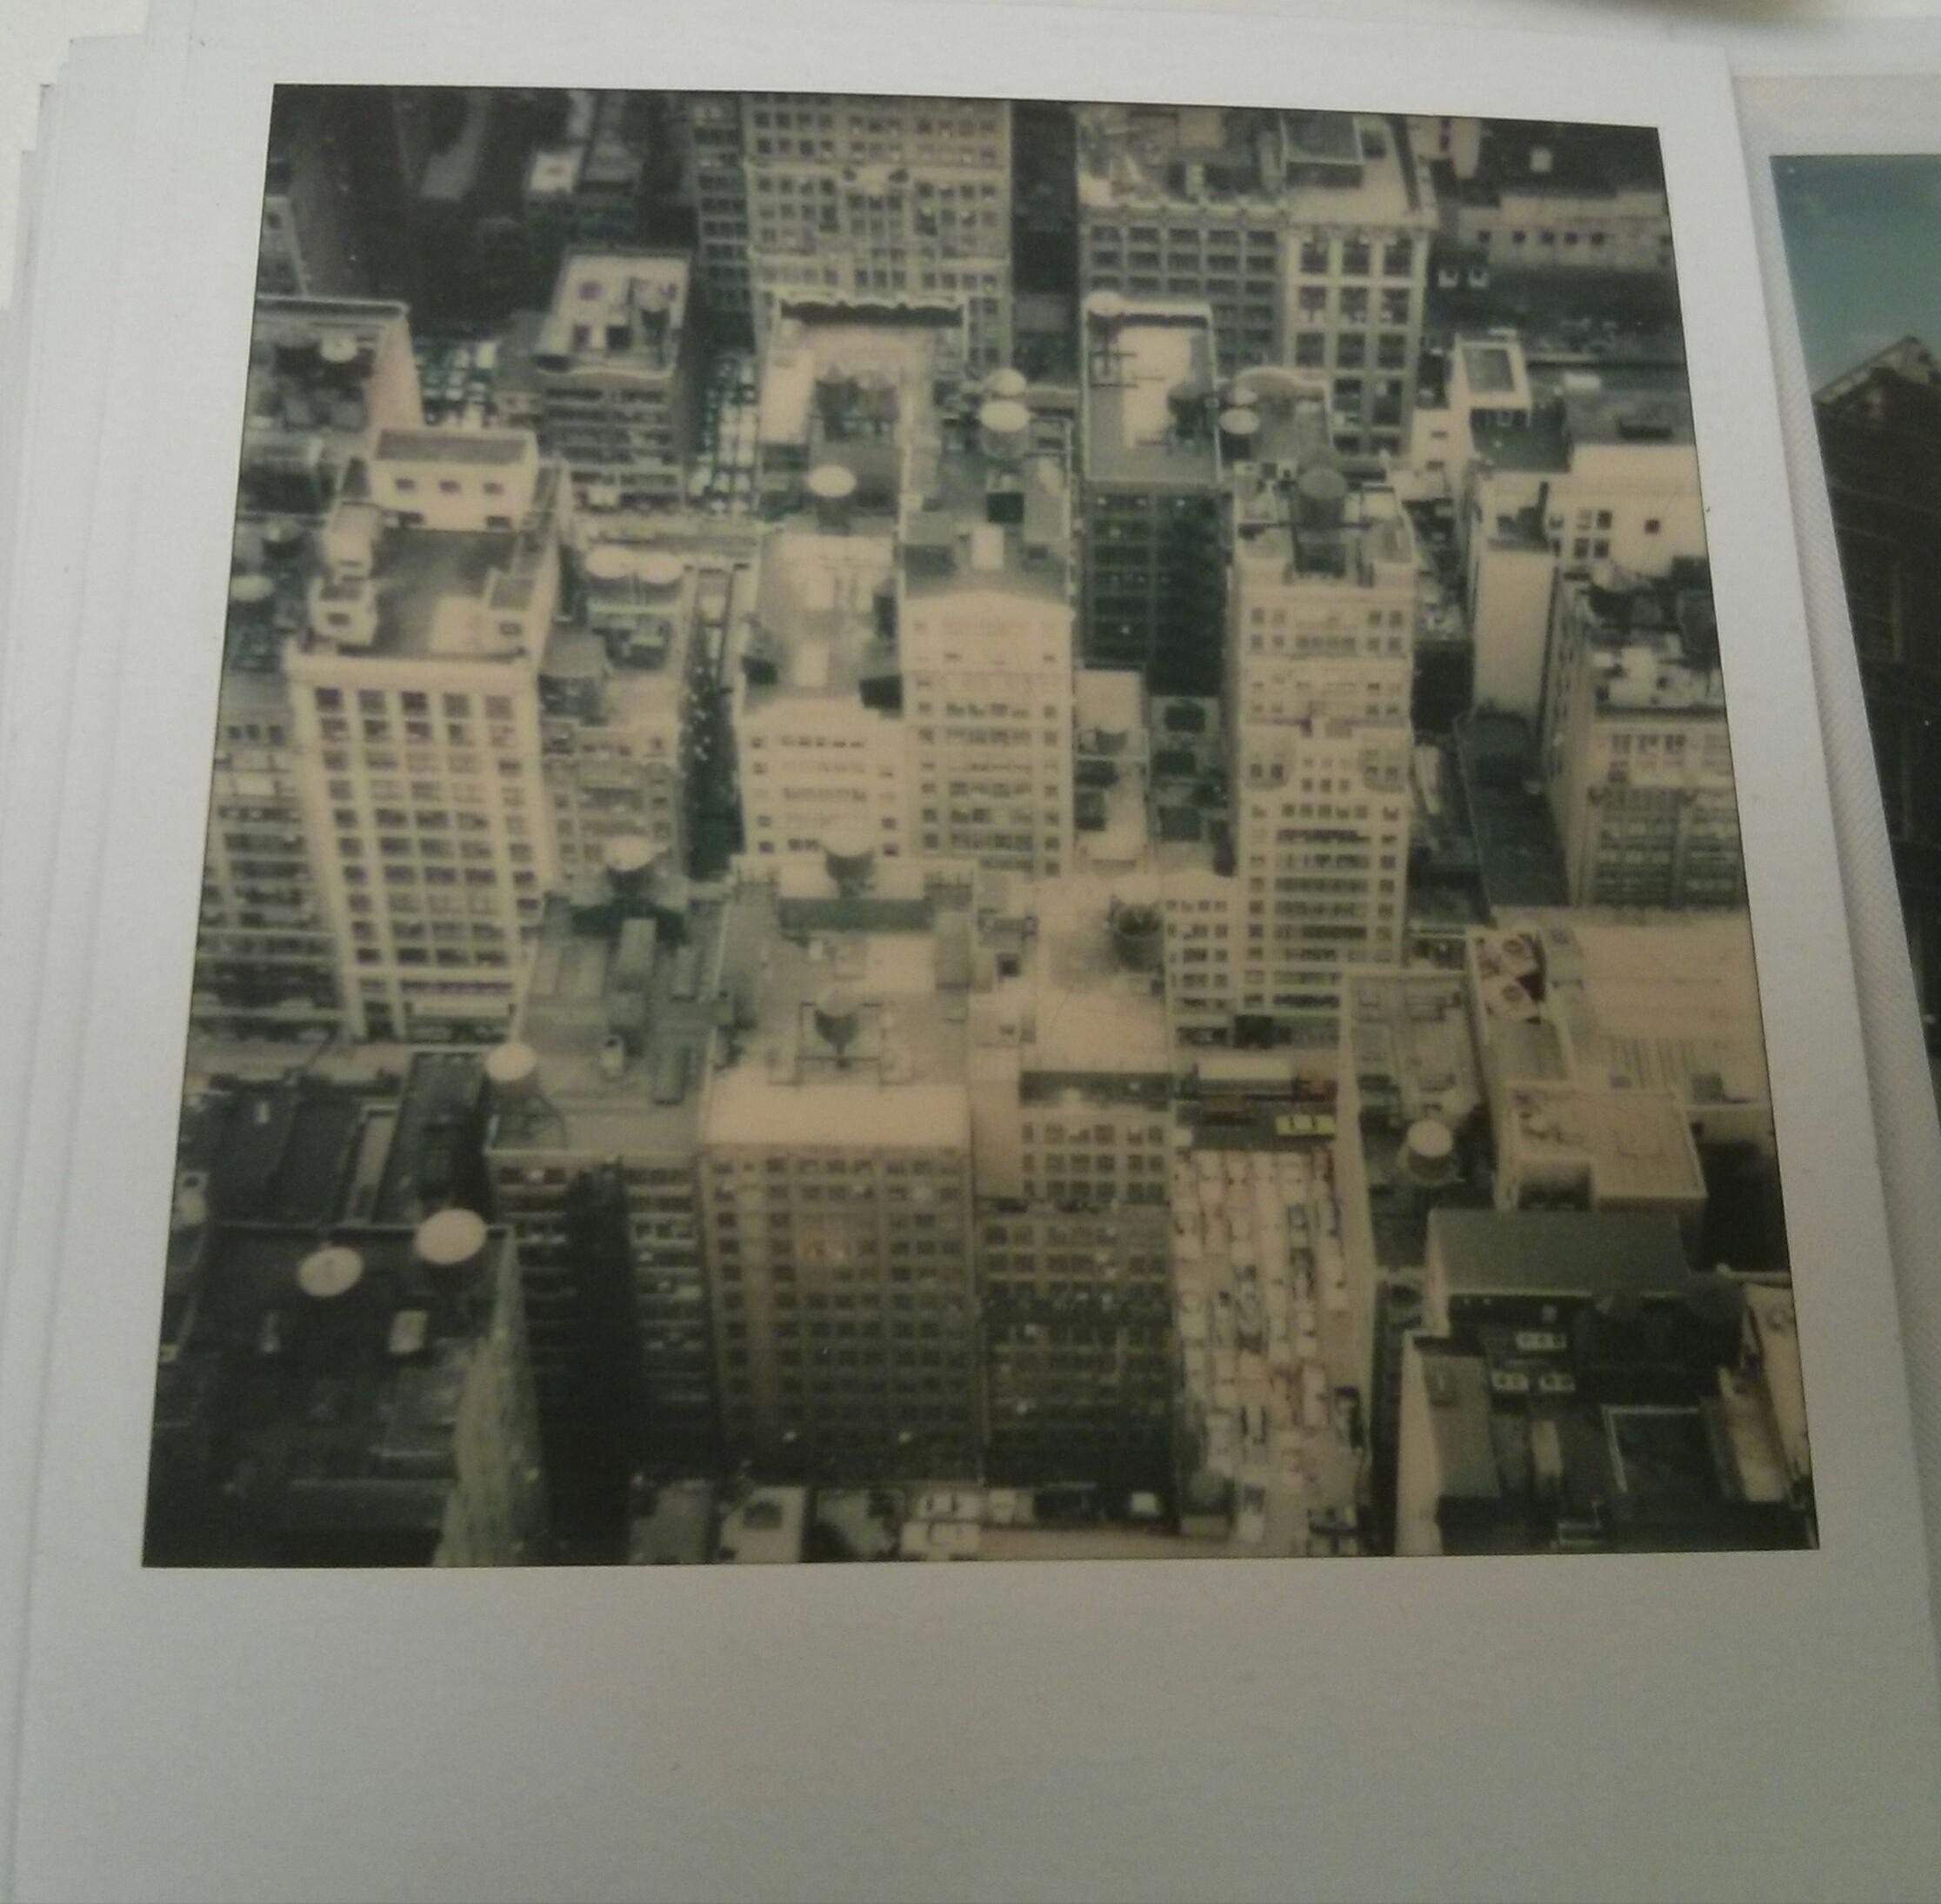 Richard Welling. Water Towers, Midtown Manhattan. 2012.284.732.